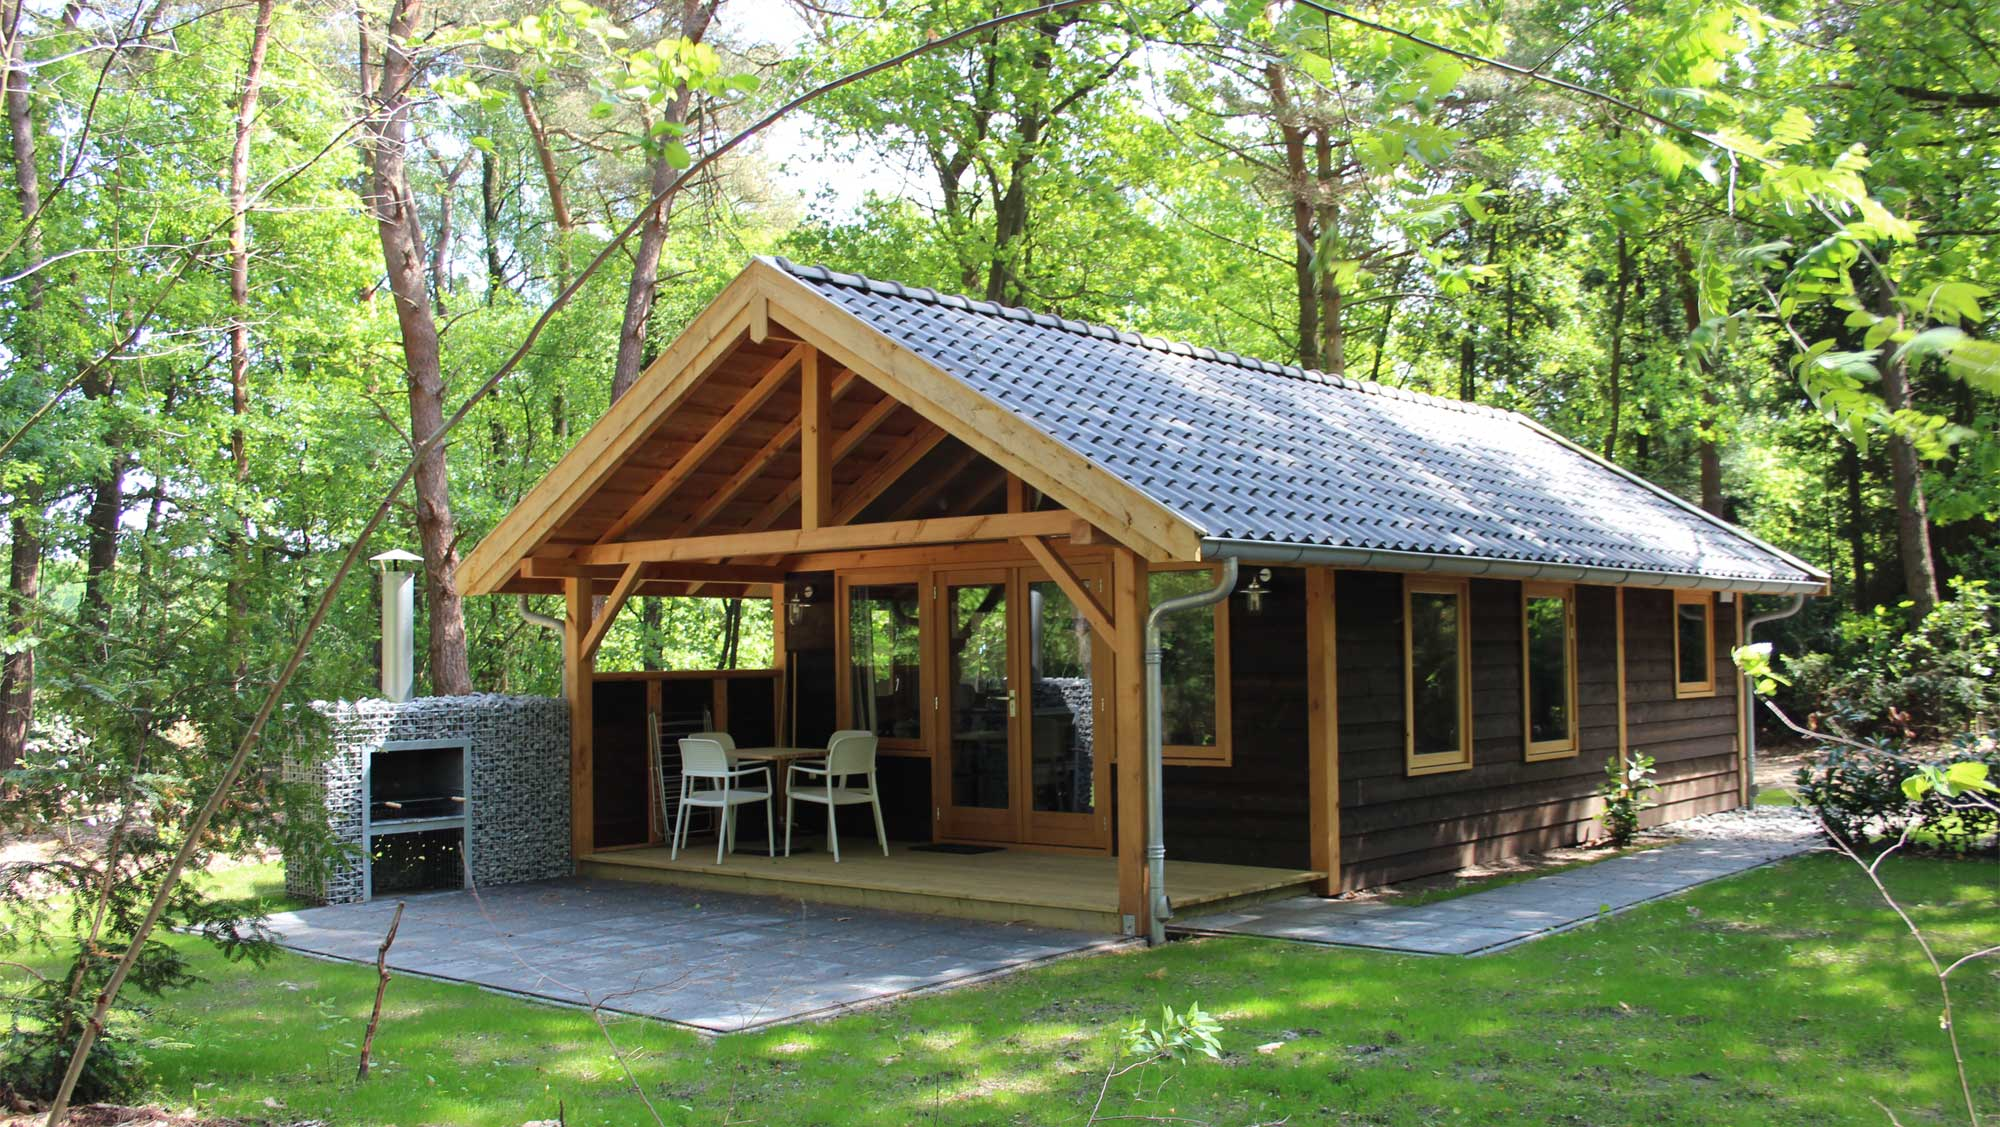 4pers bungalow Bosuil Molecaten Park De Koerberg 01